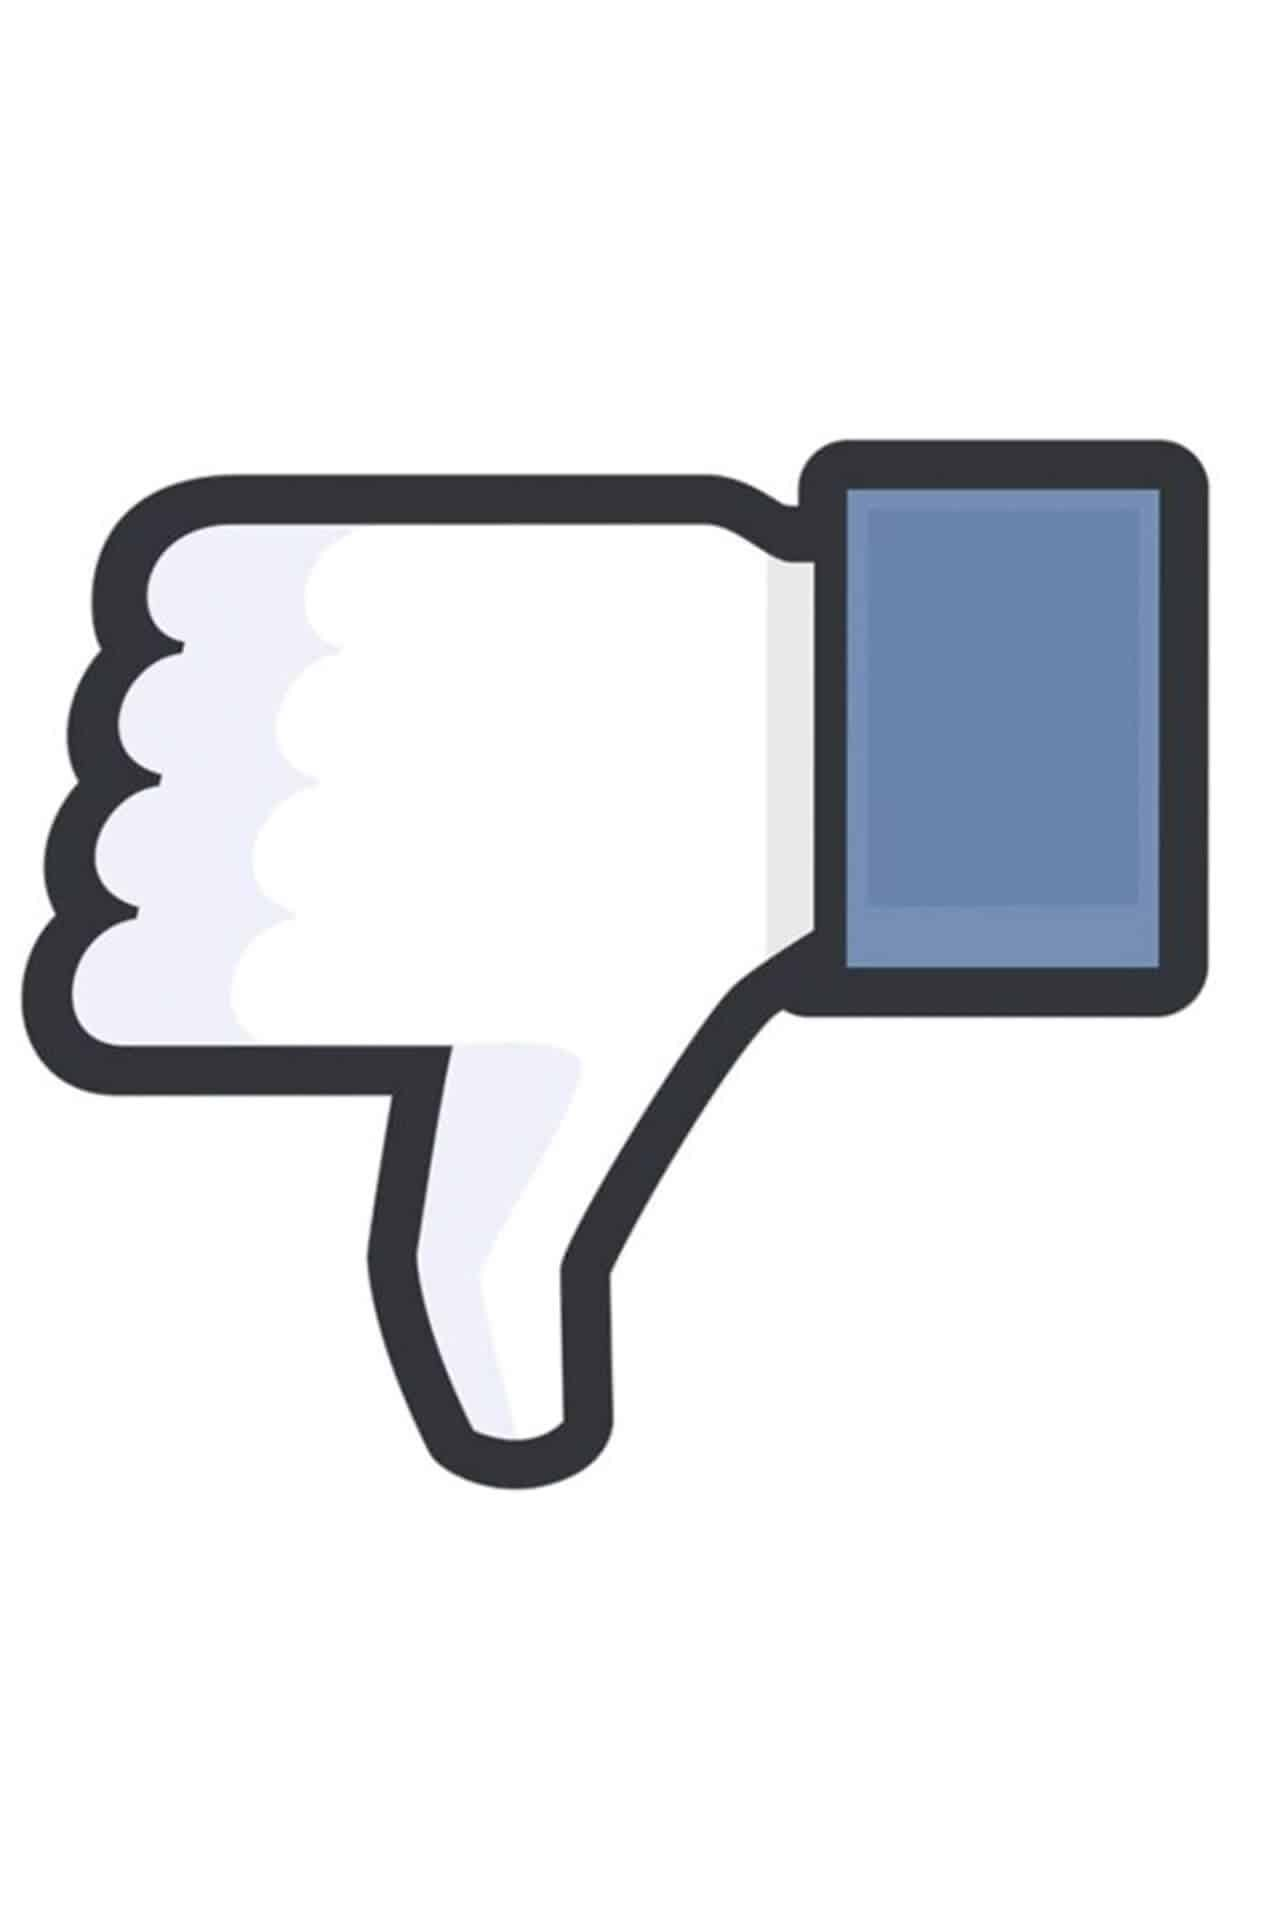 Facebook utenti in calo